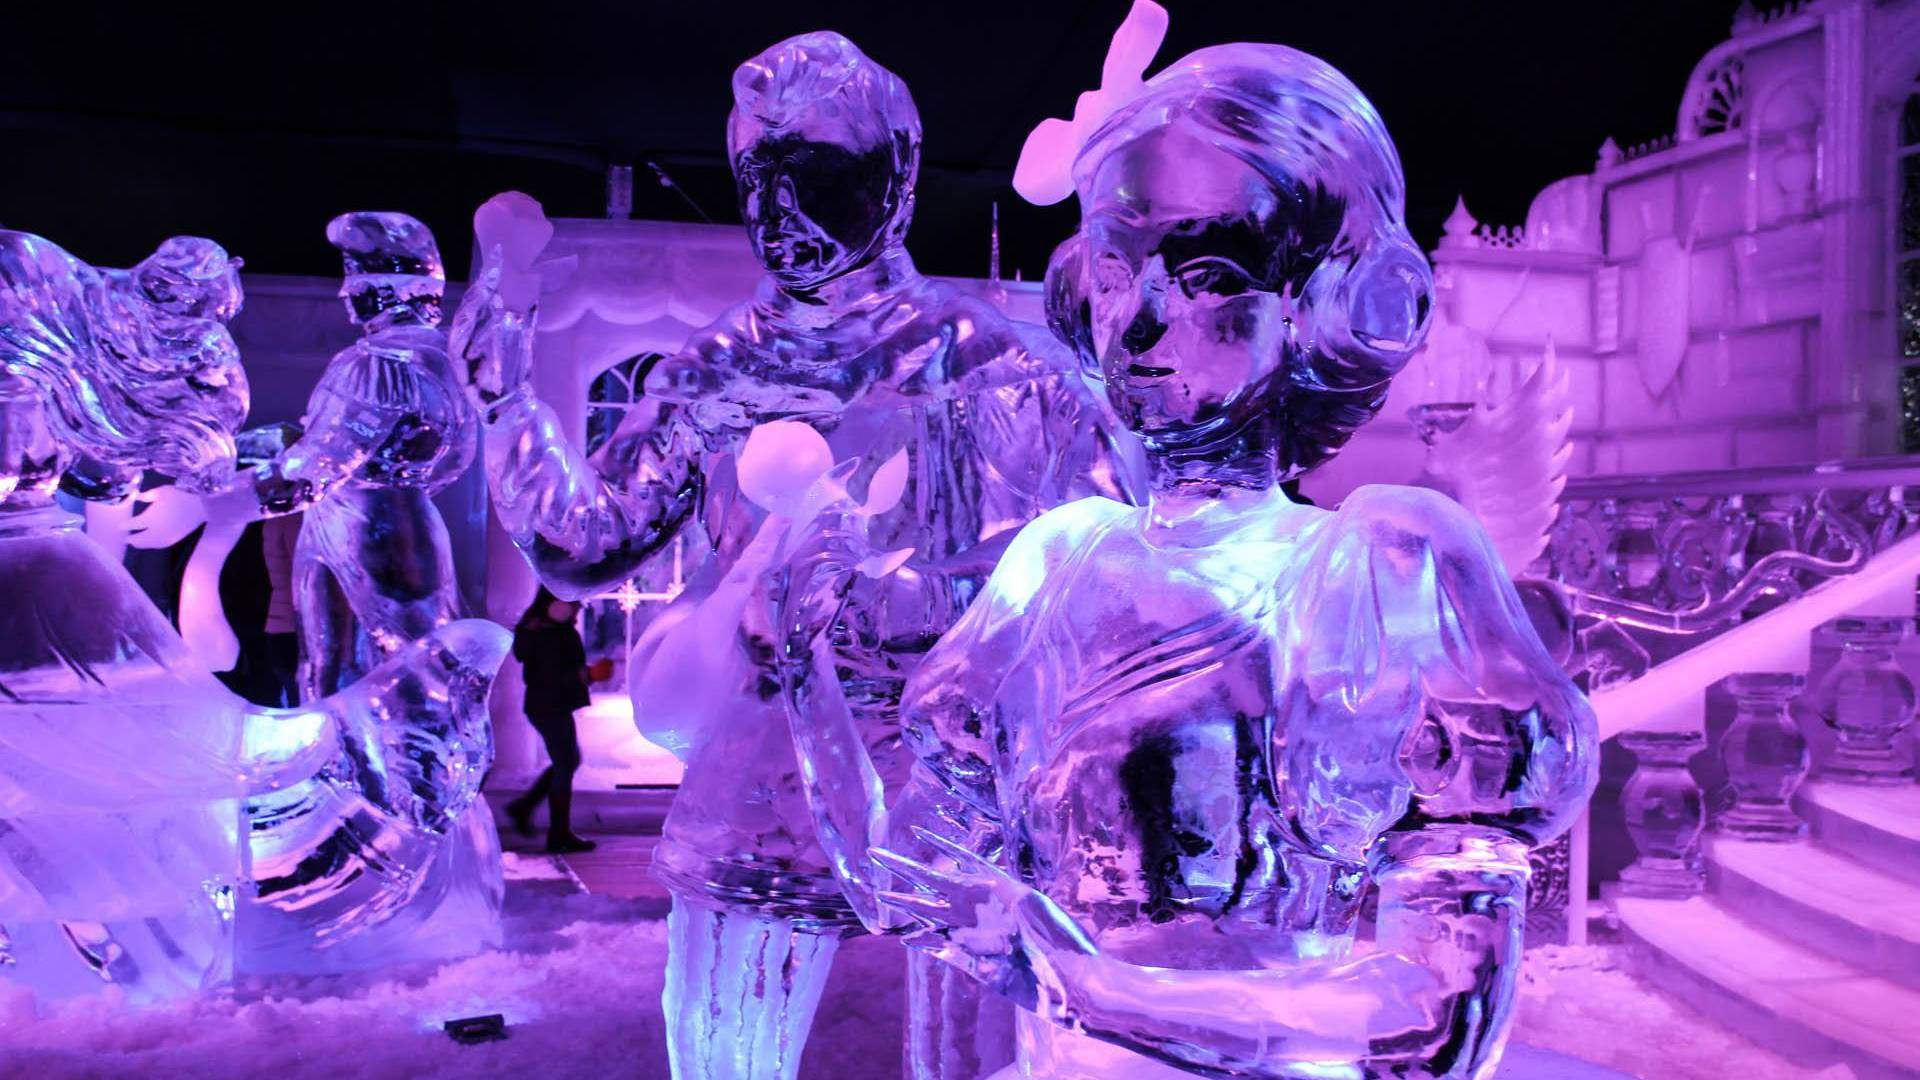 Disney's frozen ice sculptures Traven Luc